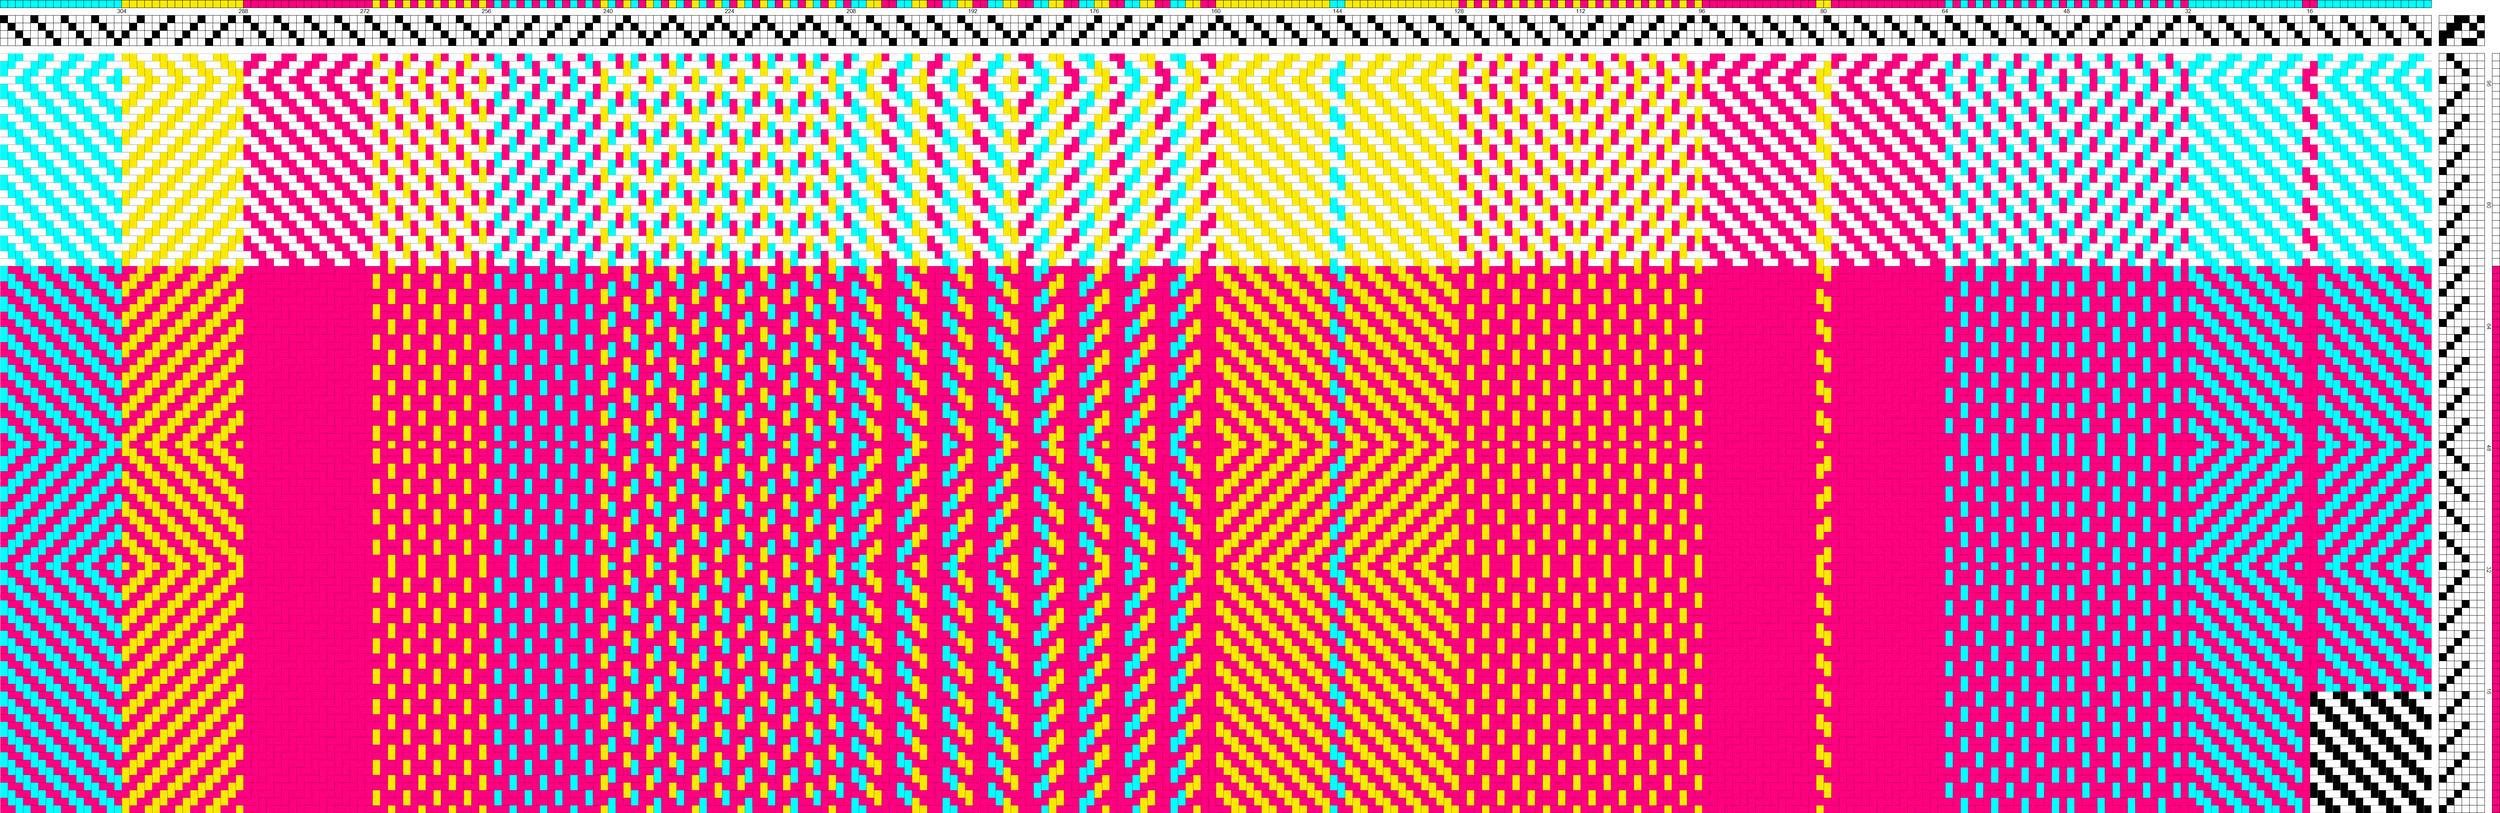 weavinglabCMYK_2.png